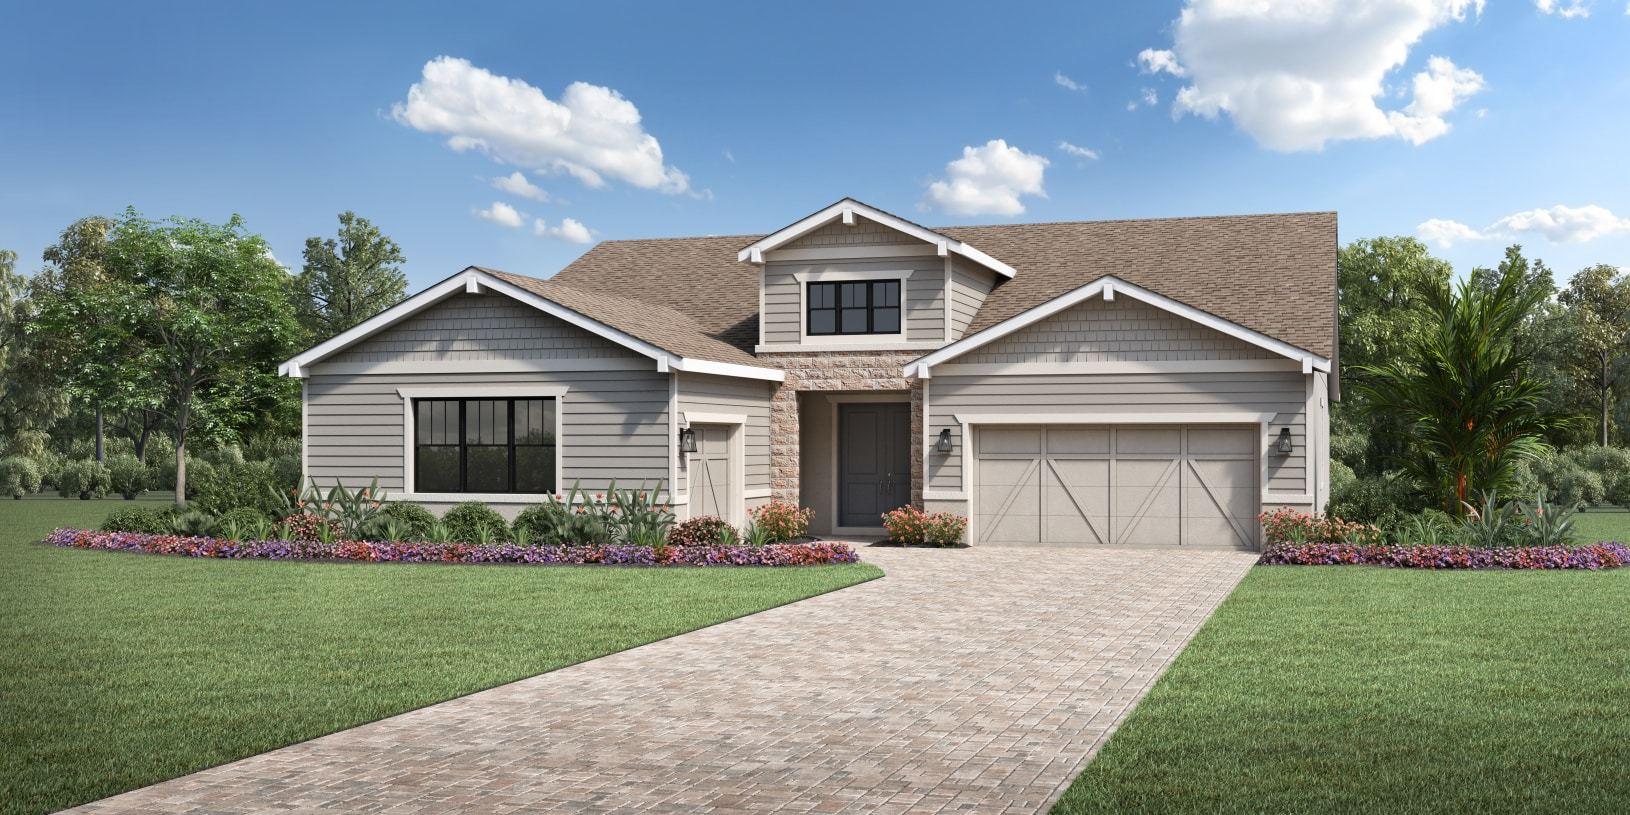 Elevation Image:Craftsman